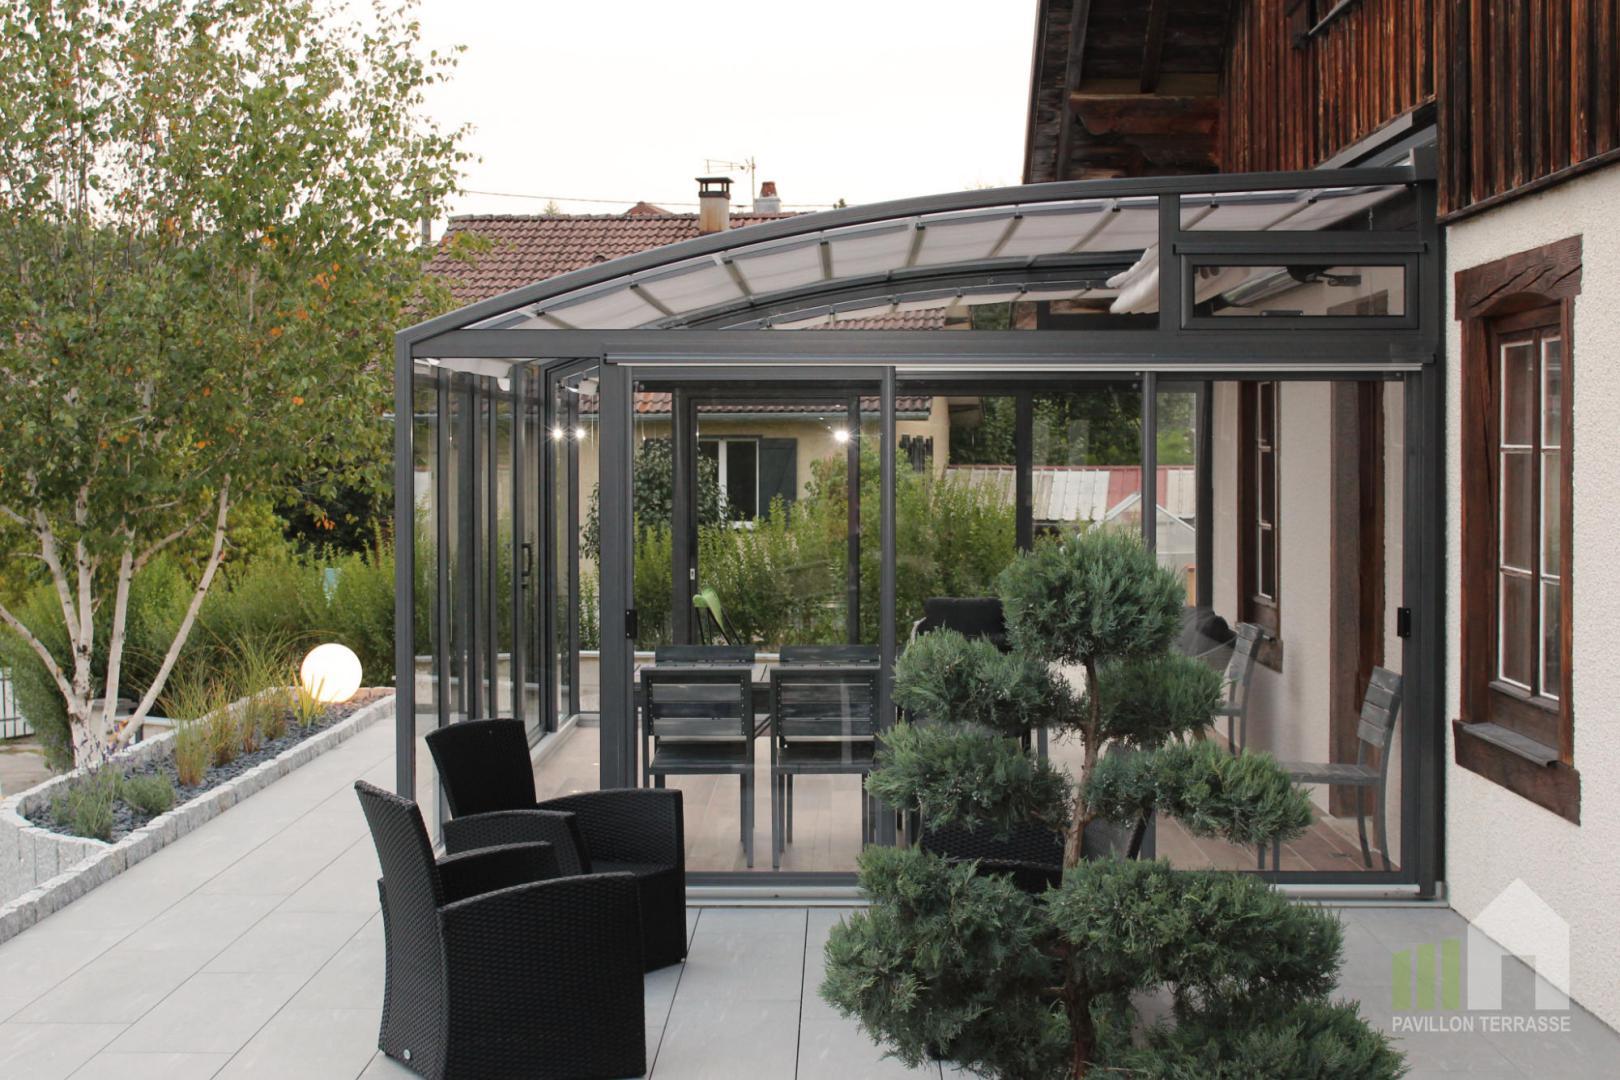 Abris Terrasse Pavillon I Solar Véranda Voroka Coulissante ... dedans Abri Terrasse Coulissant